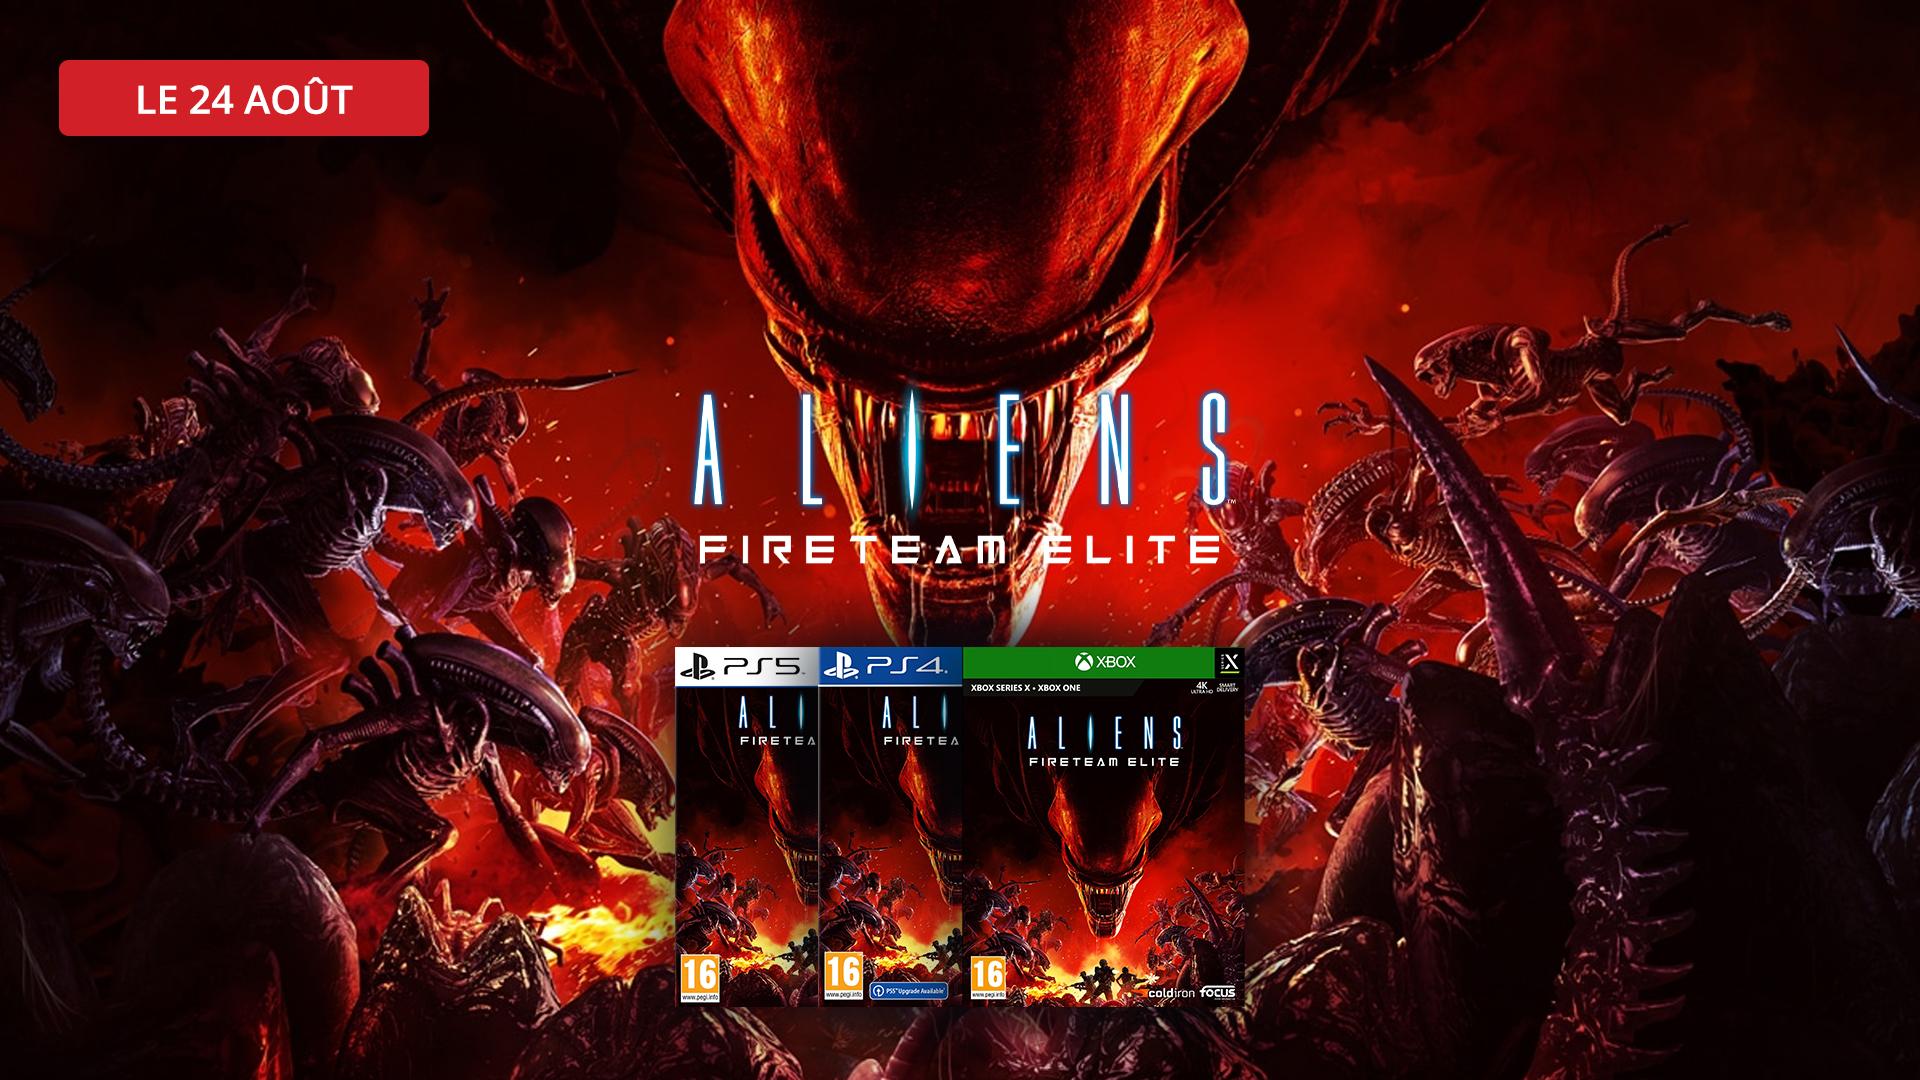 Alien fire team